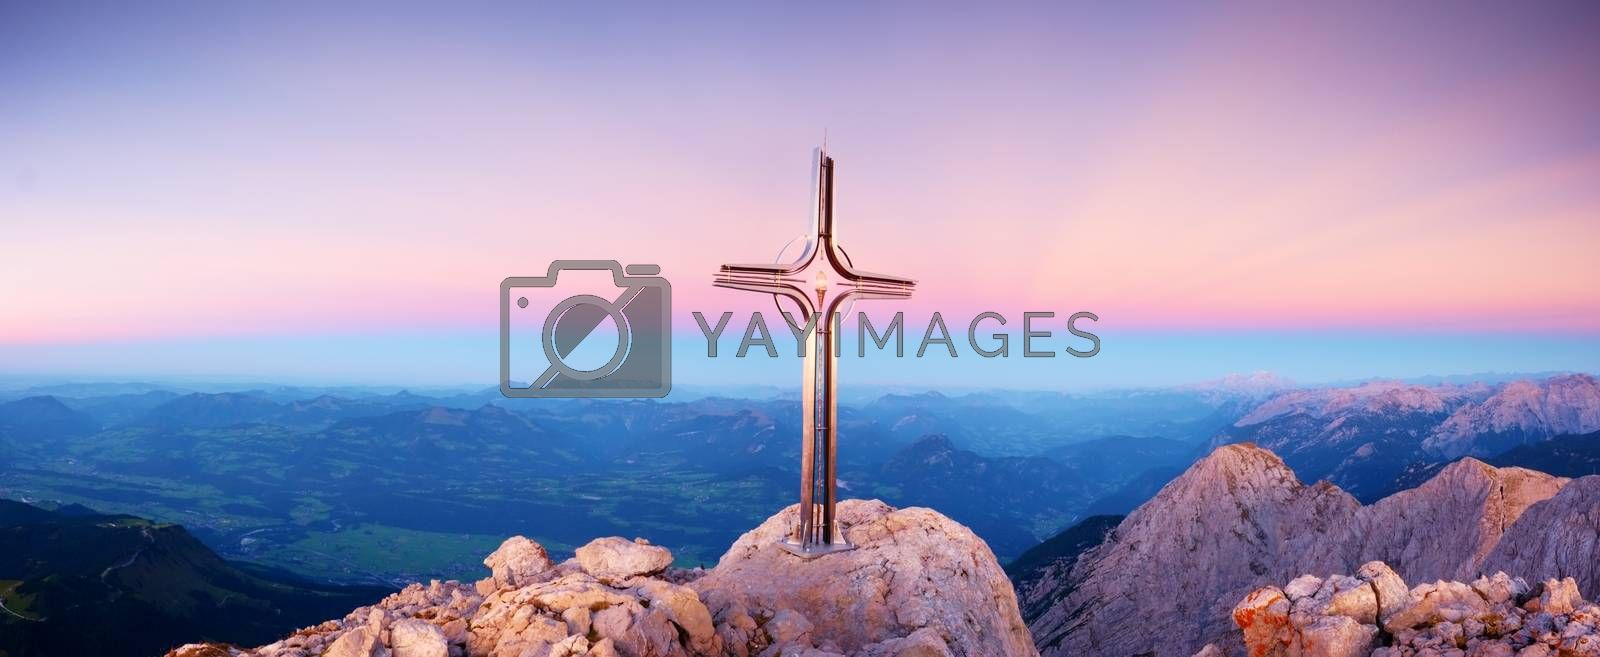 Hoher Goell autumn daybreak panorama. Iron cross at mountain top in Alp at Austria Germany border.  View to Tennen Range and Dachstein range, Berchtesgaden Alps.